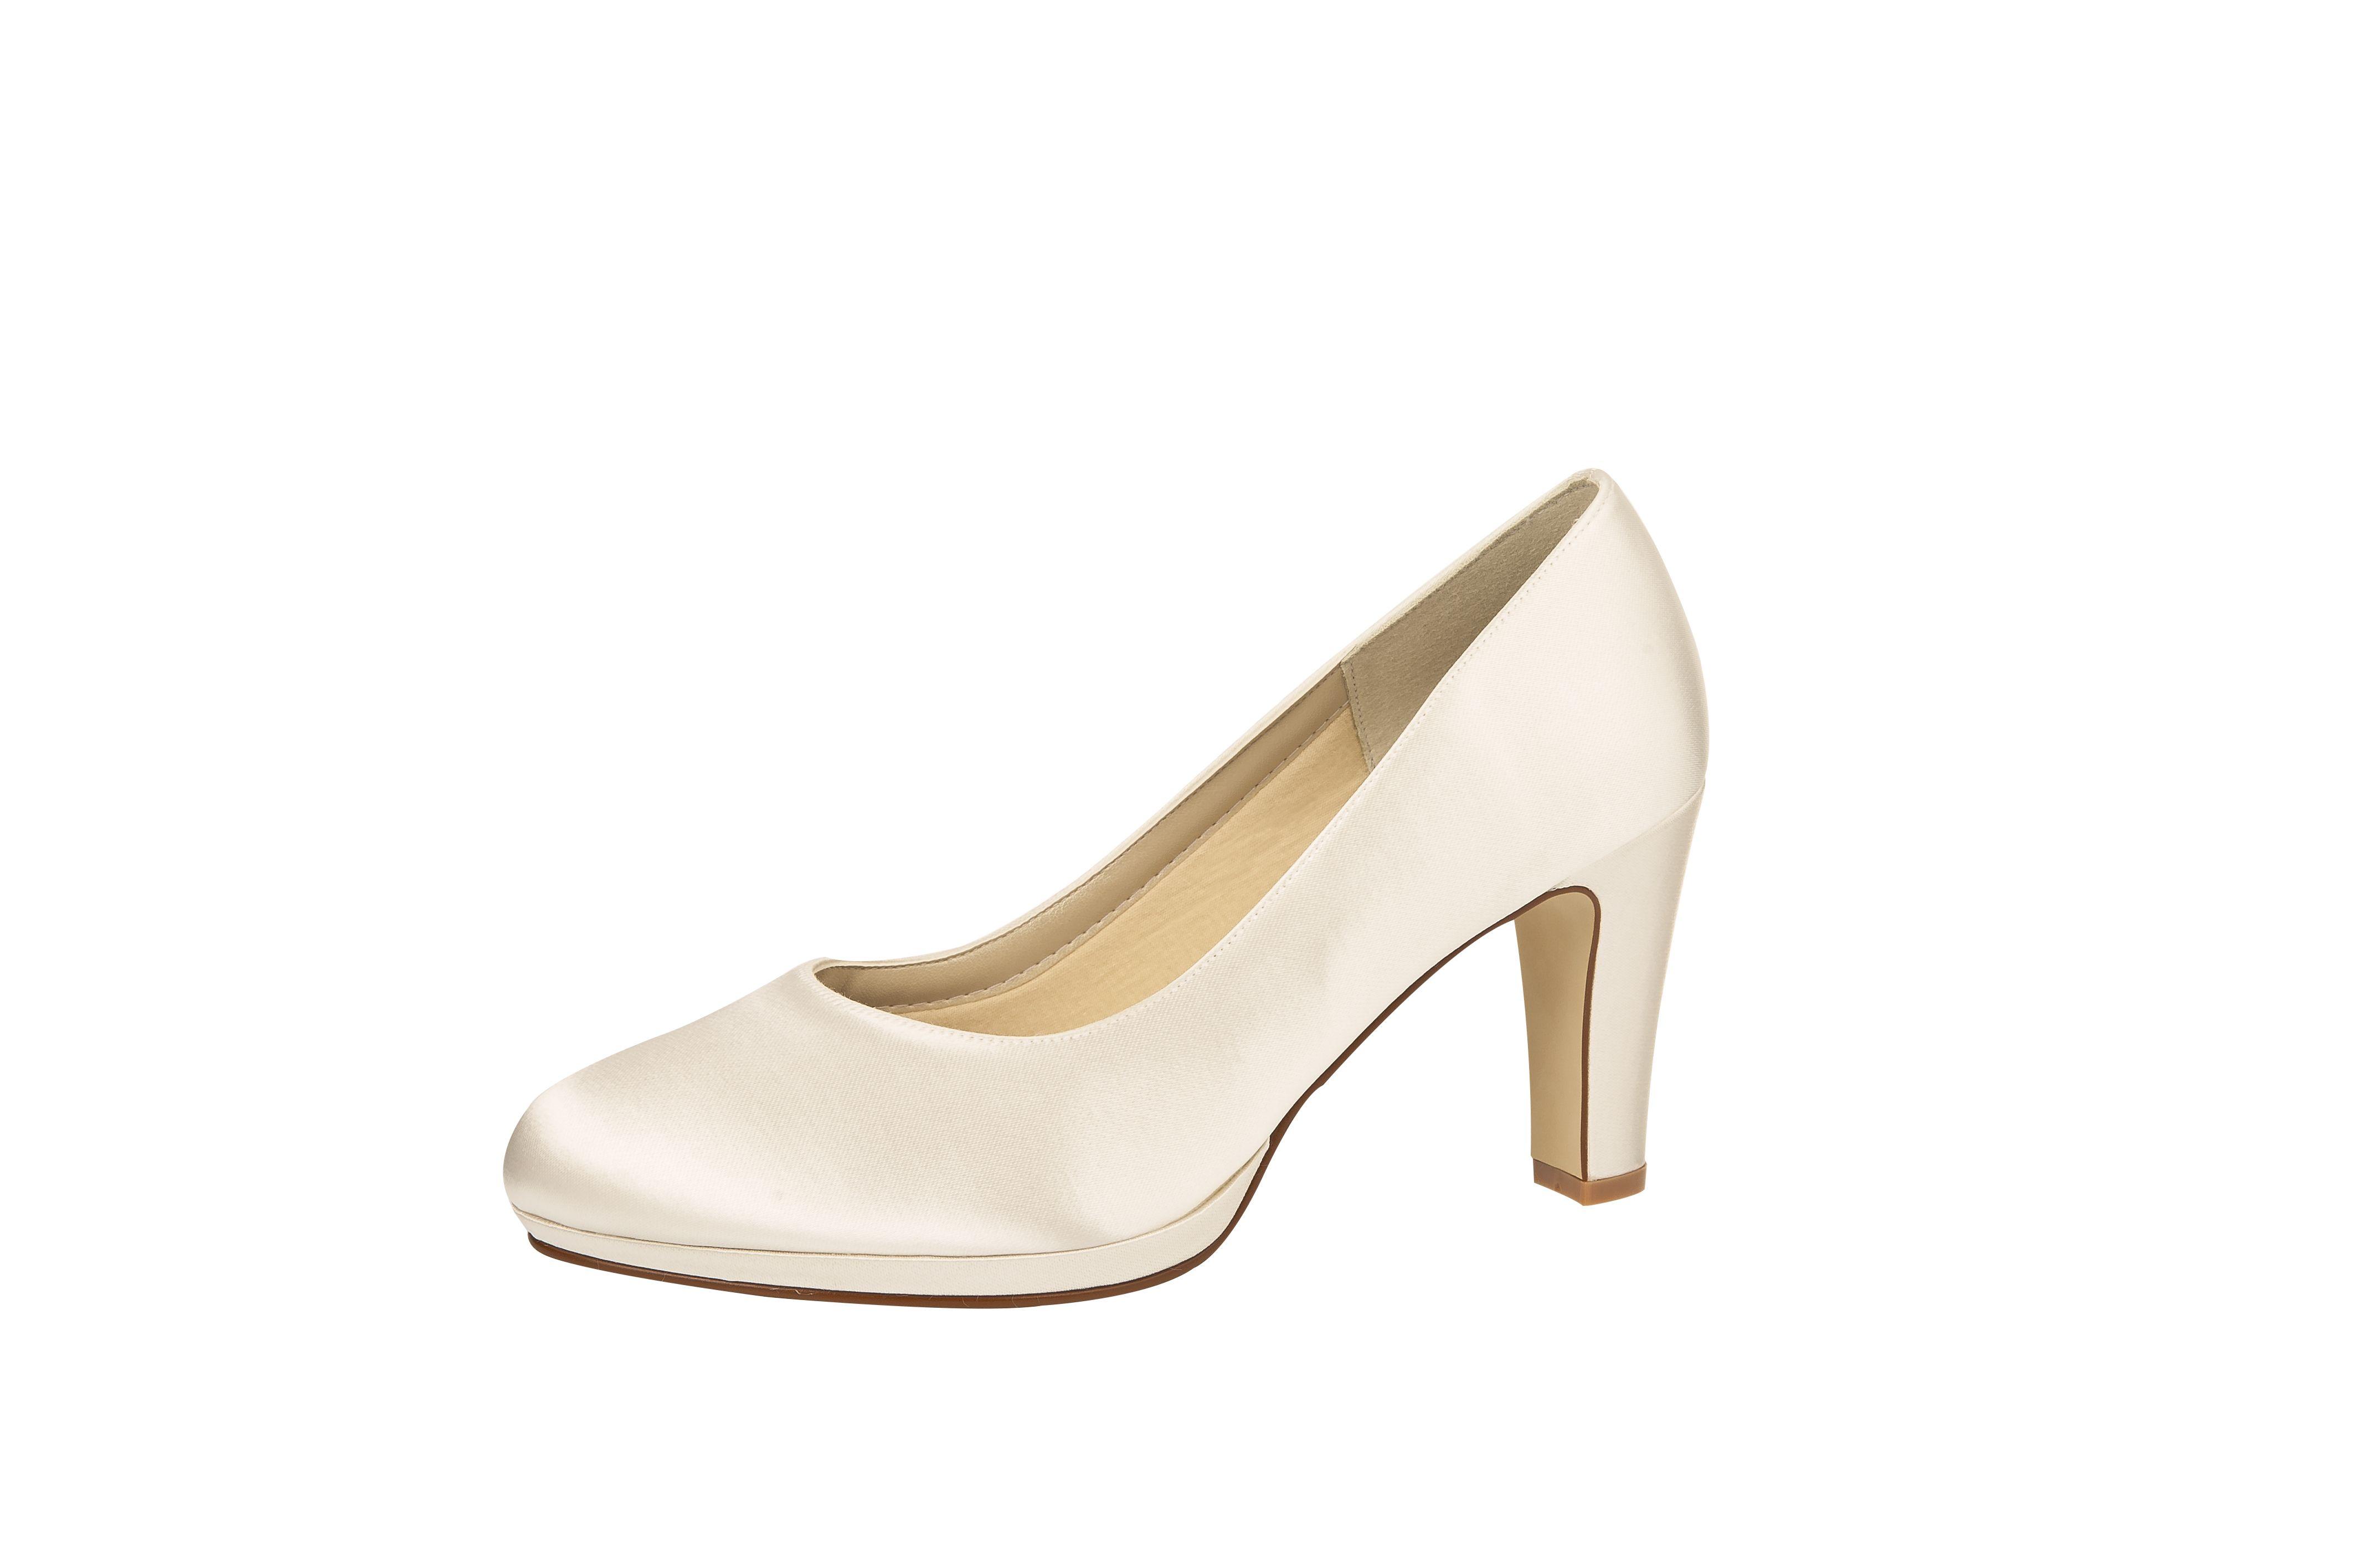 Brudesko fra | Bryllup brud smykker+sko | Brudesko